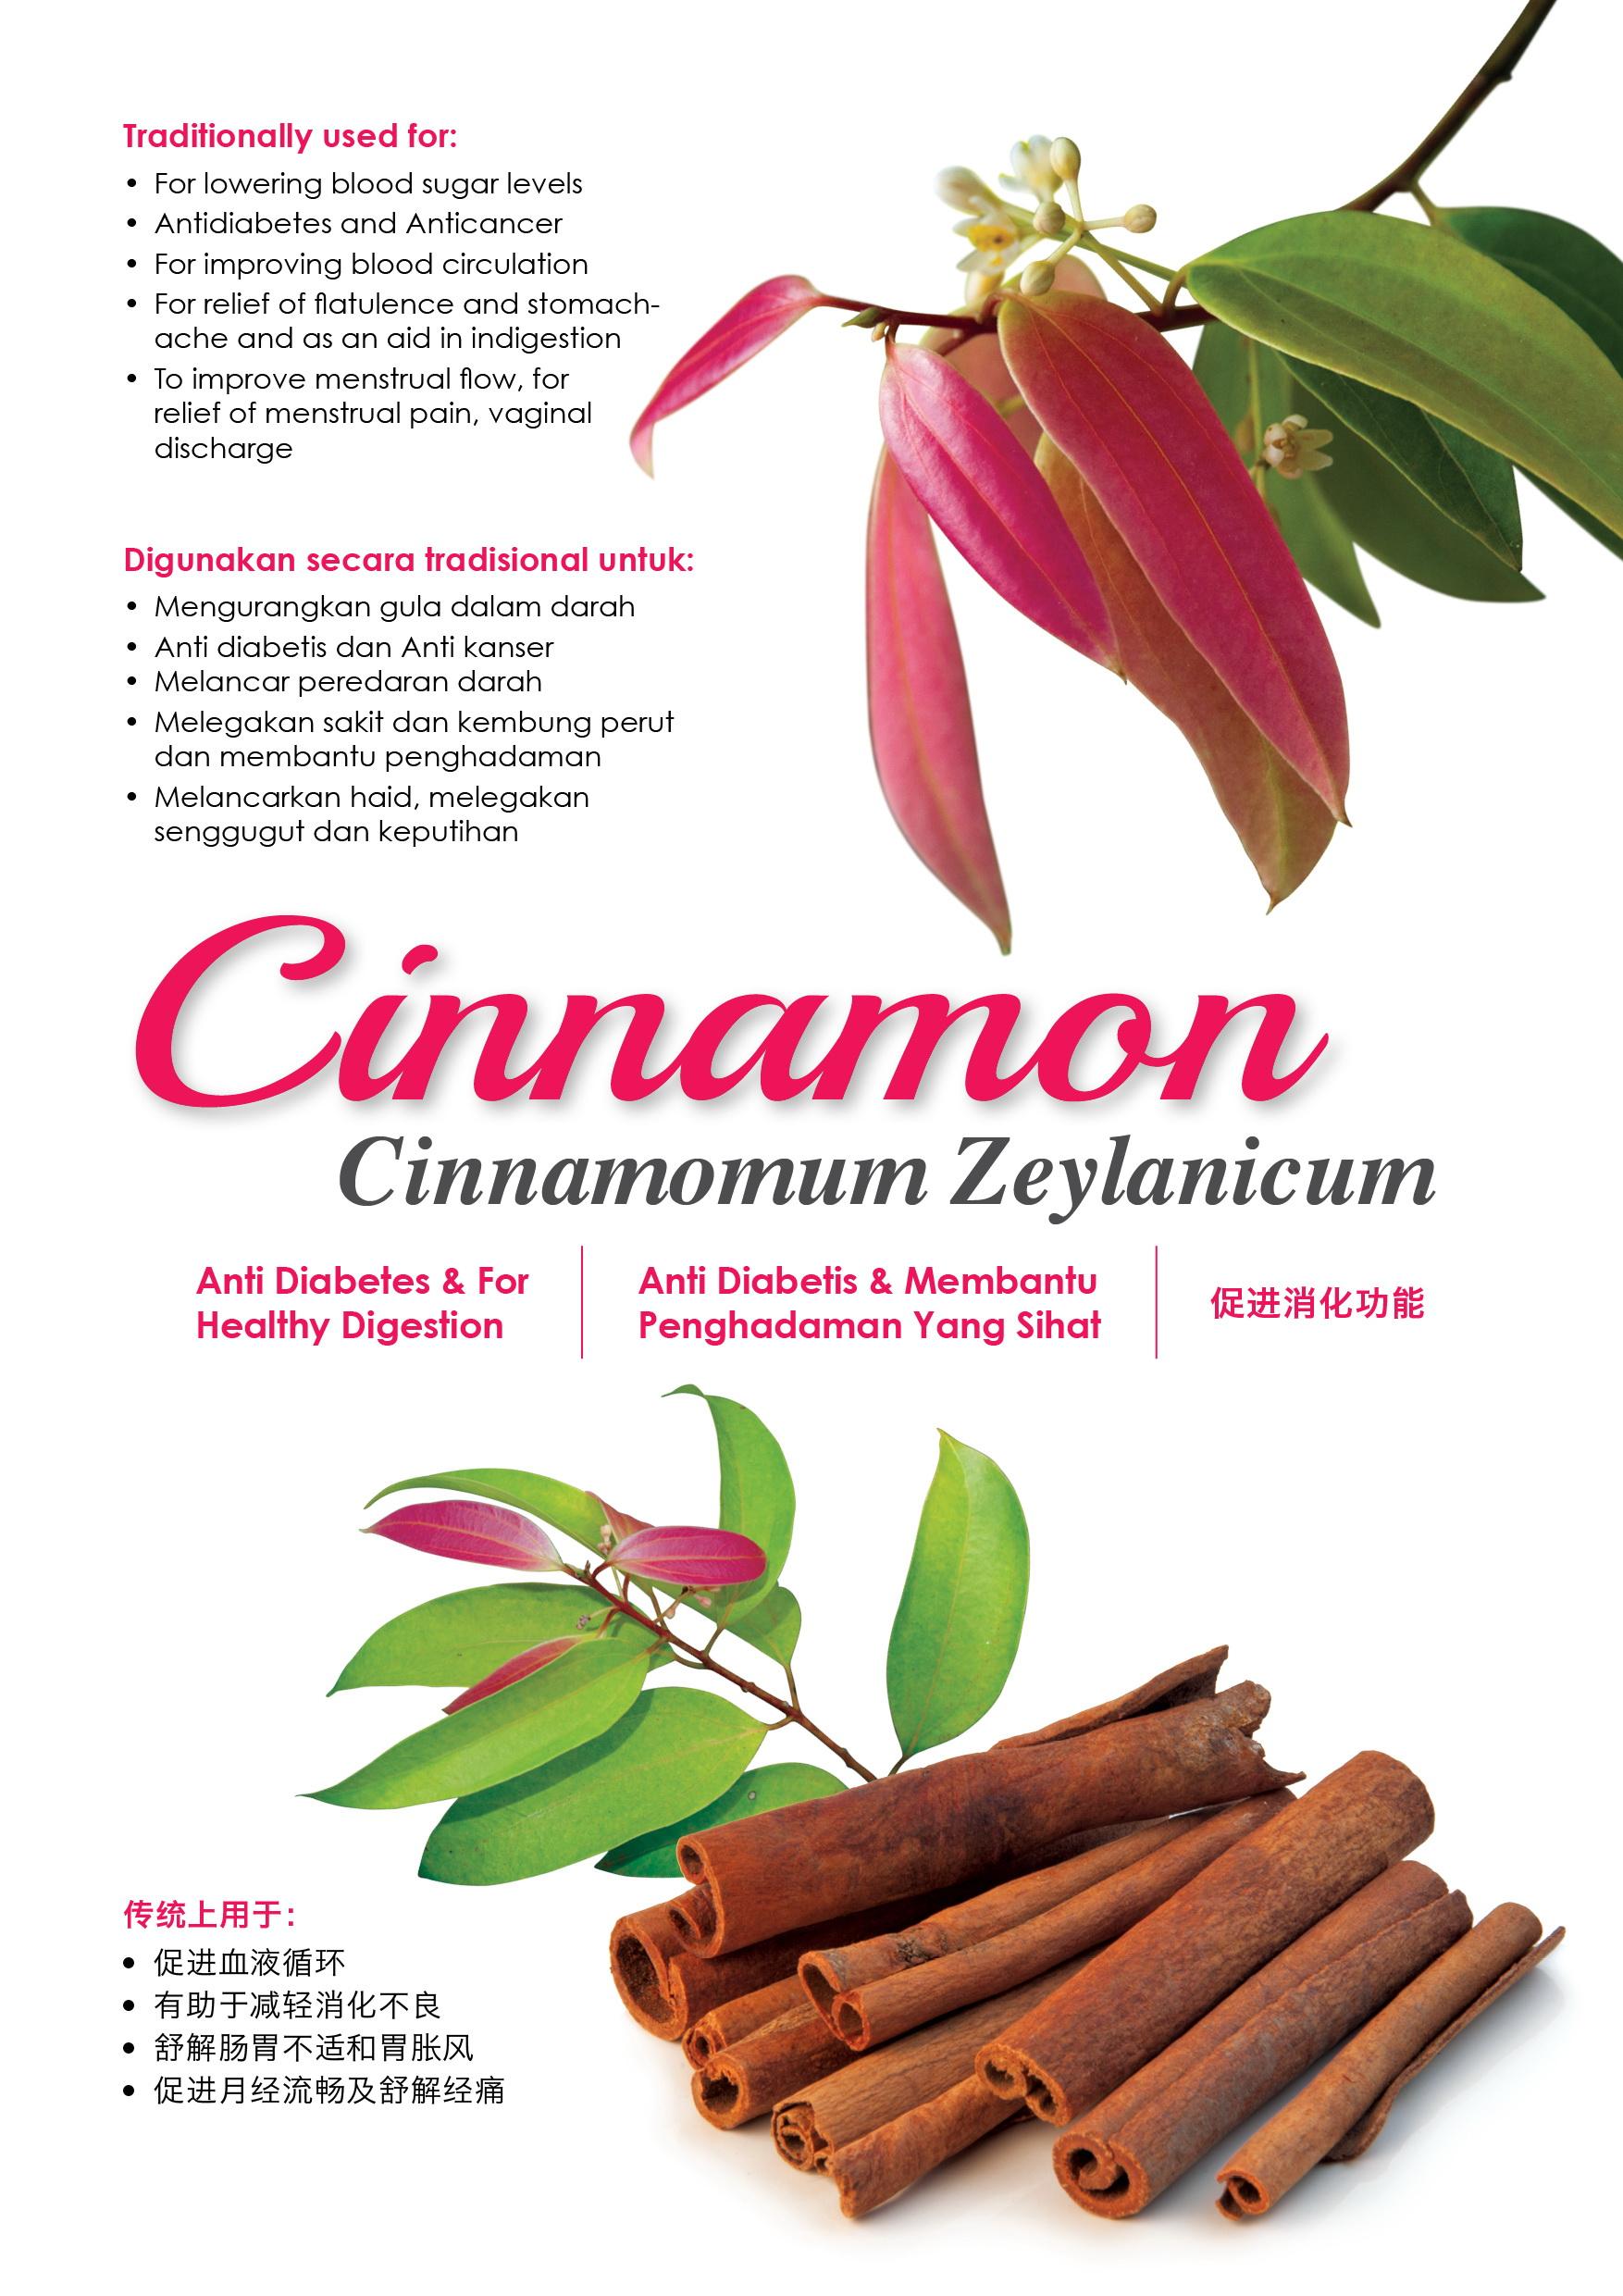 Poster_cinnamon_yoe1-ra.jpg?148421760098